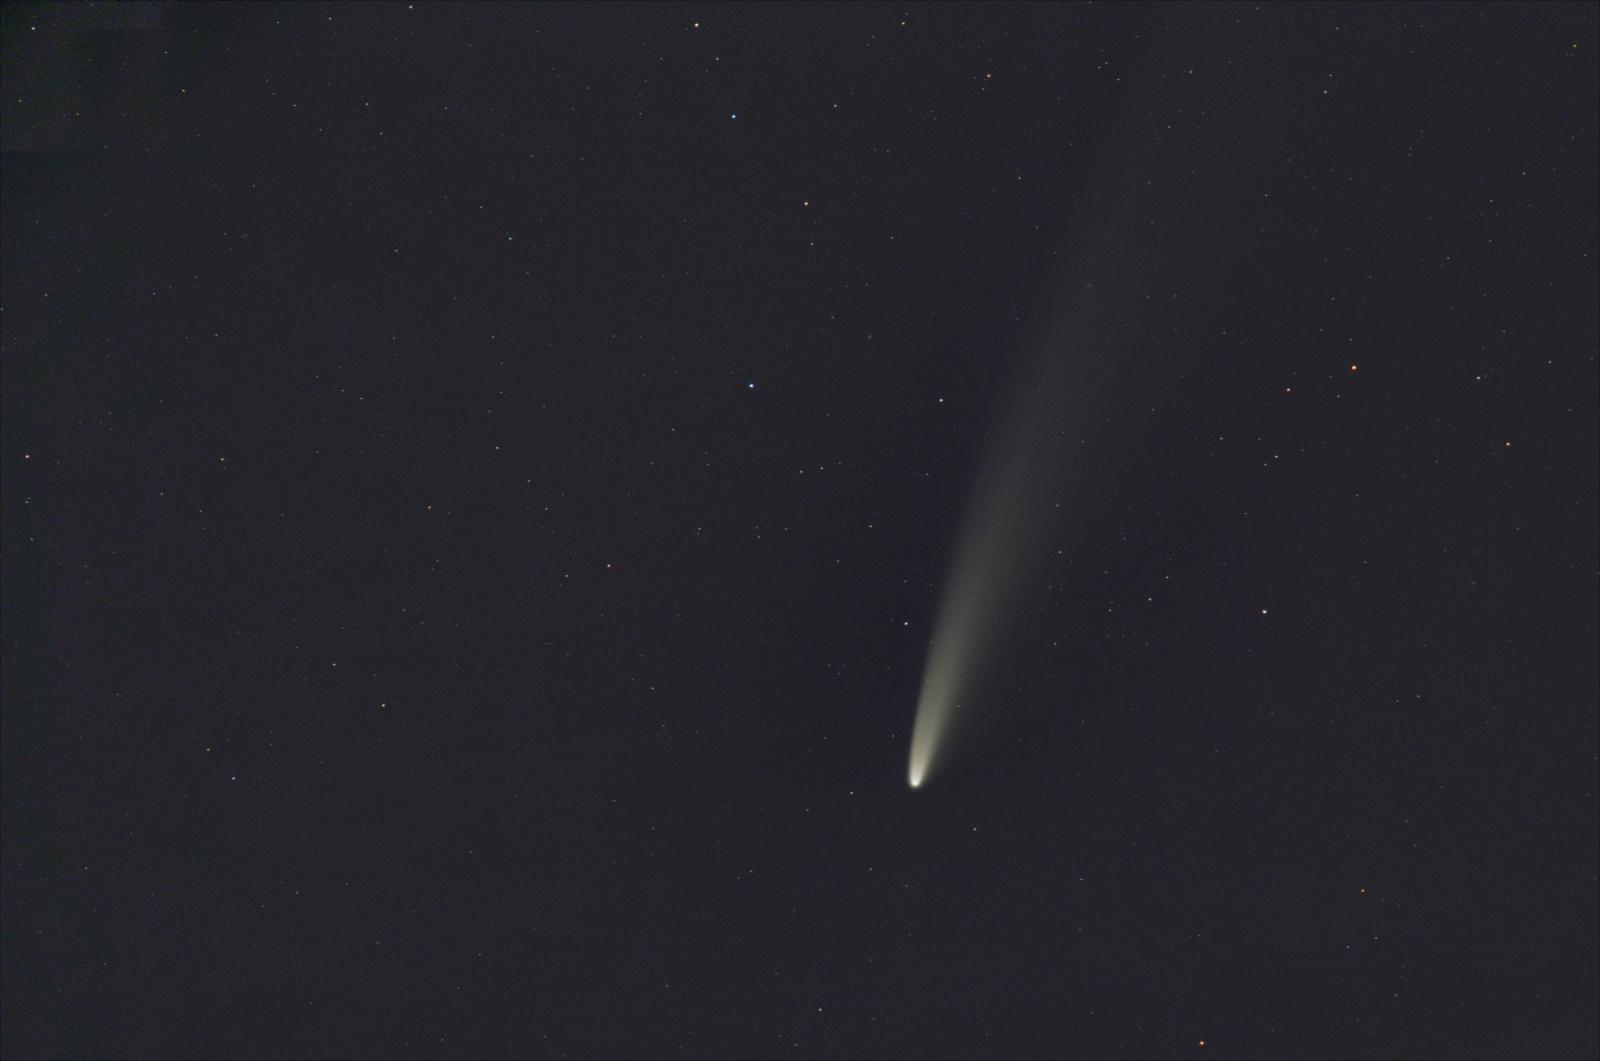 396167764_C2020F3NEOWISE.thumb.jpg.d6826847680f3a5de579fc16a7c4d50f.jpg